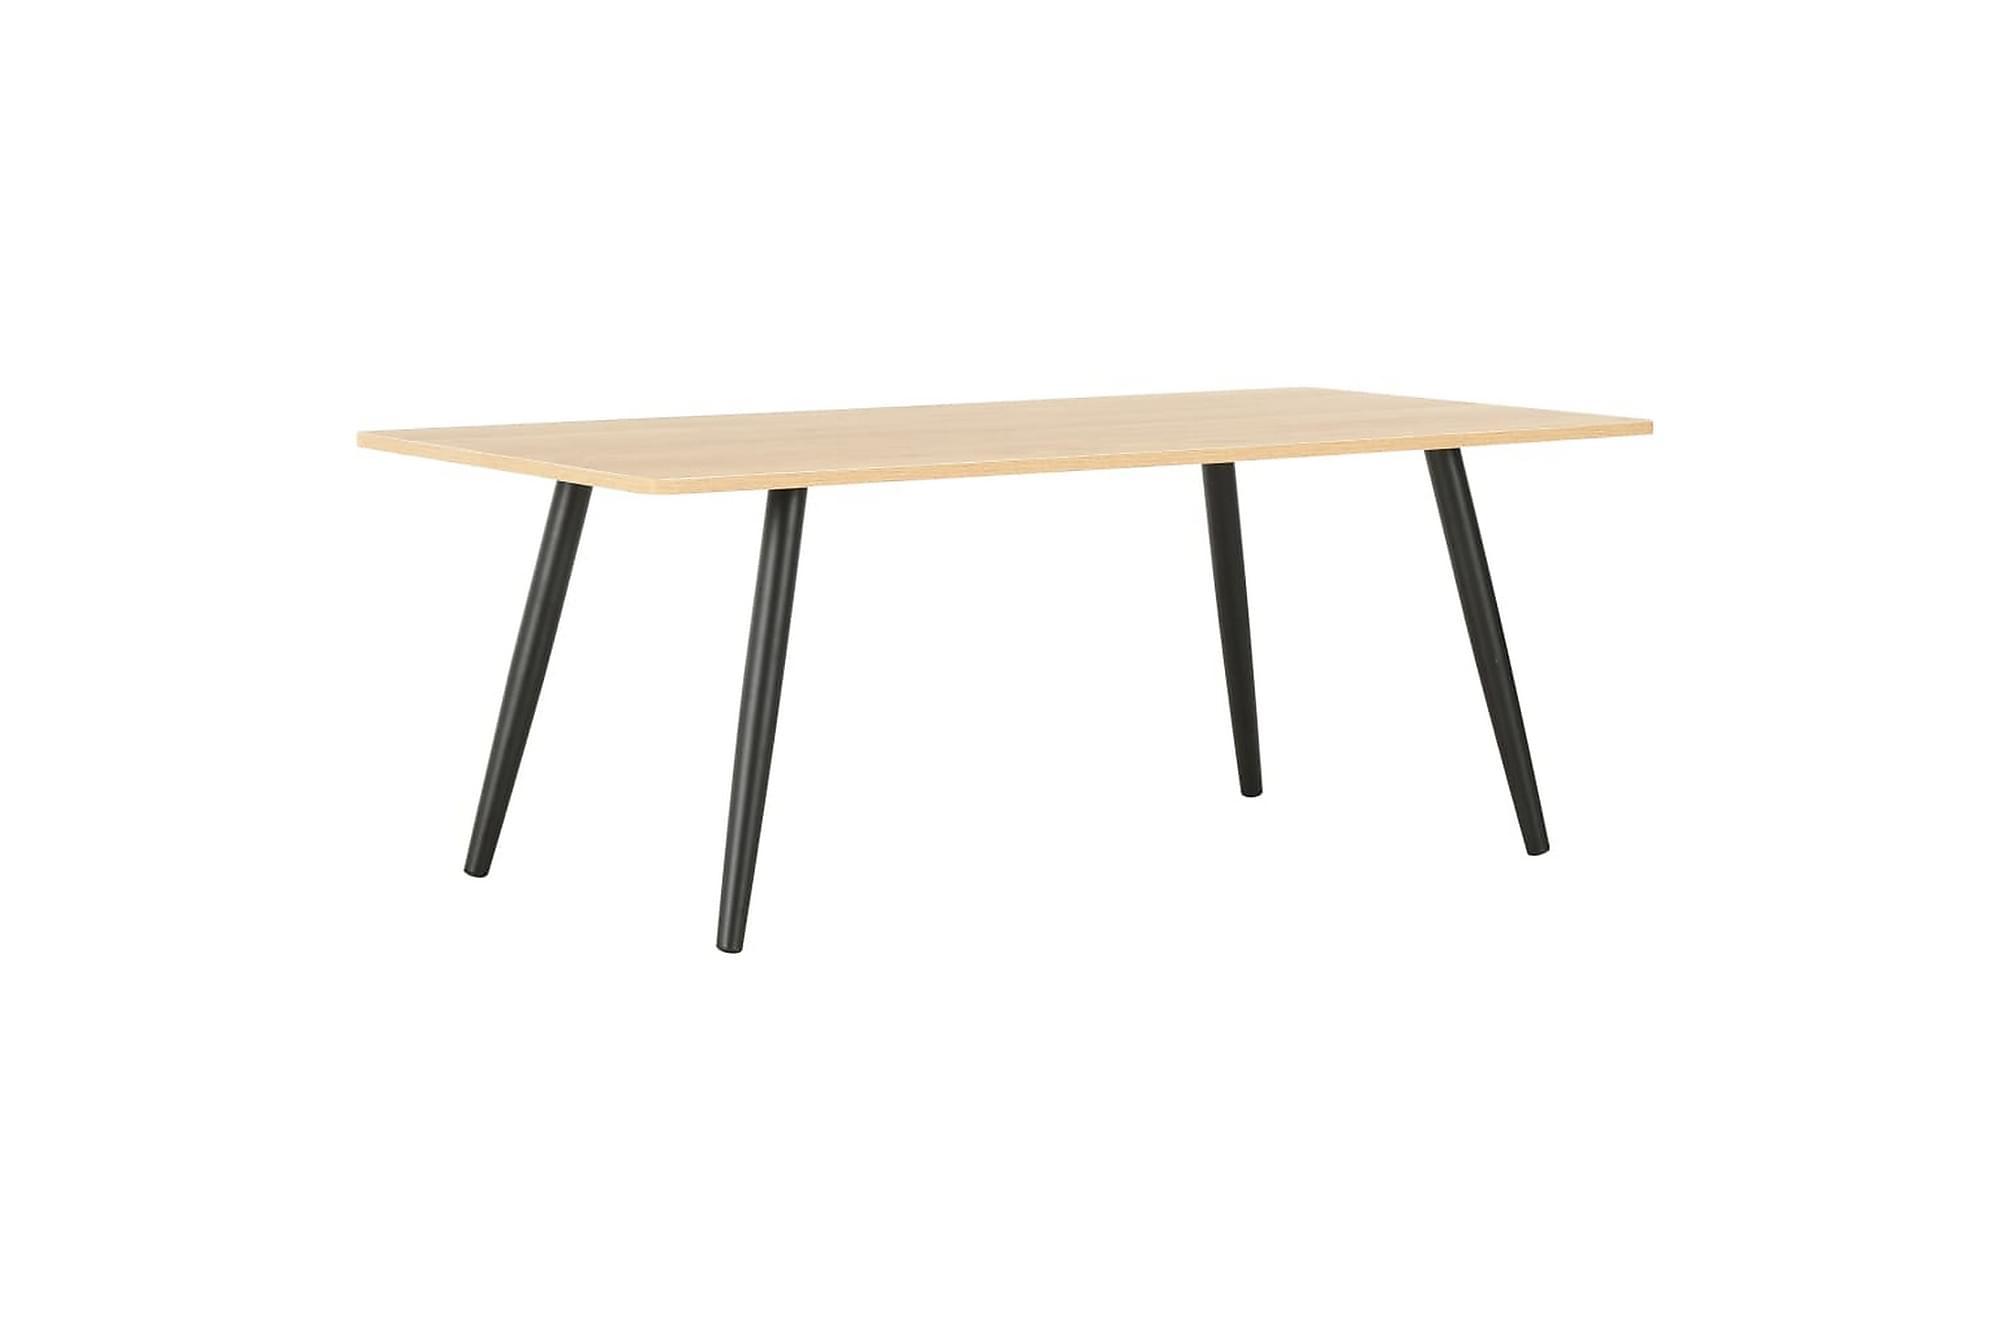 Soffbord svart och ek 120x60x46 cm